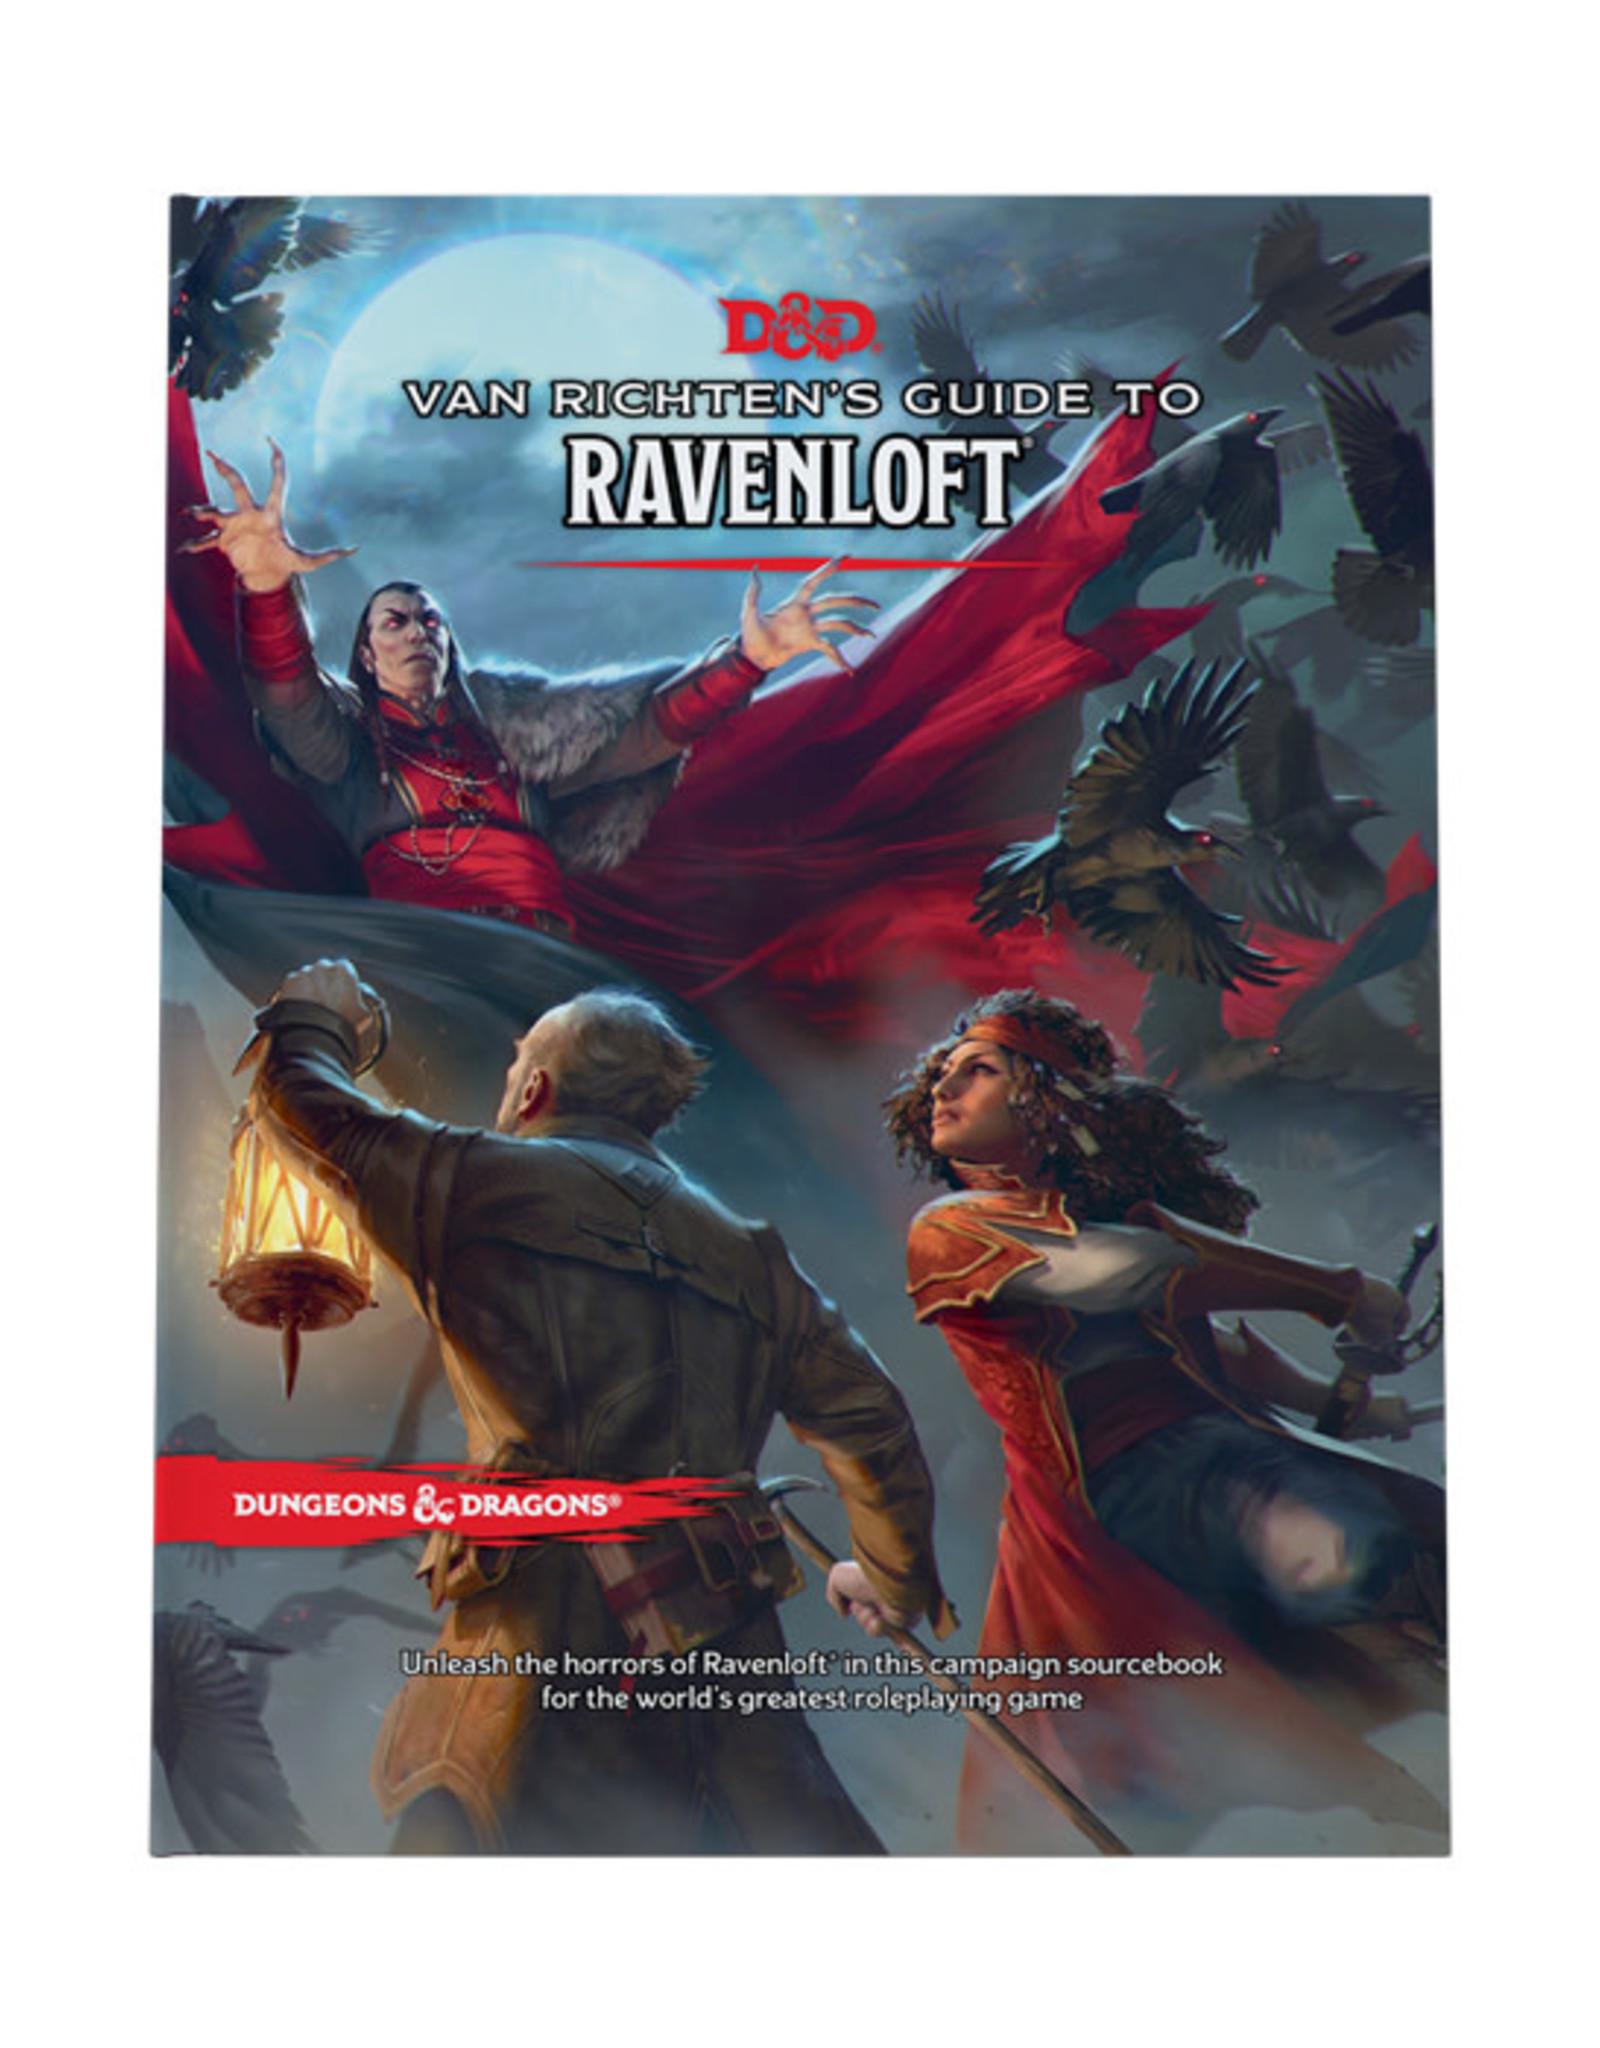 Dungeons & Dragons Dungeons & Dragons: 5th Edition - Van Richten's Guide to Ravenloft